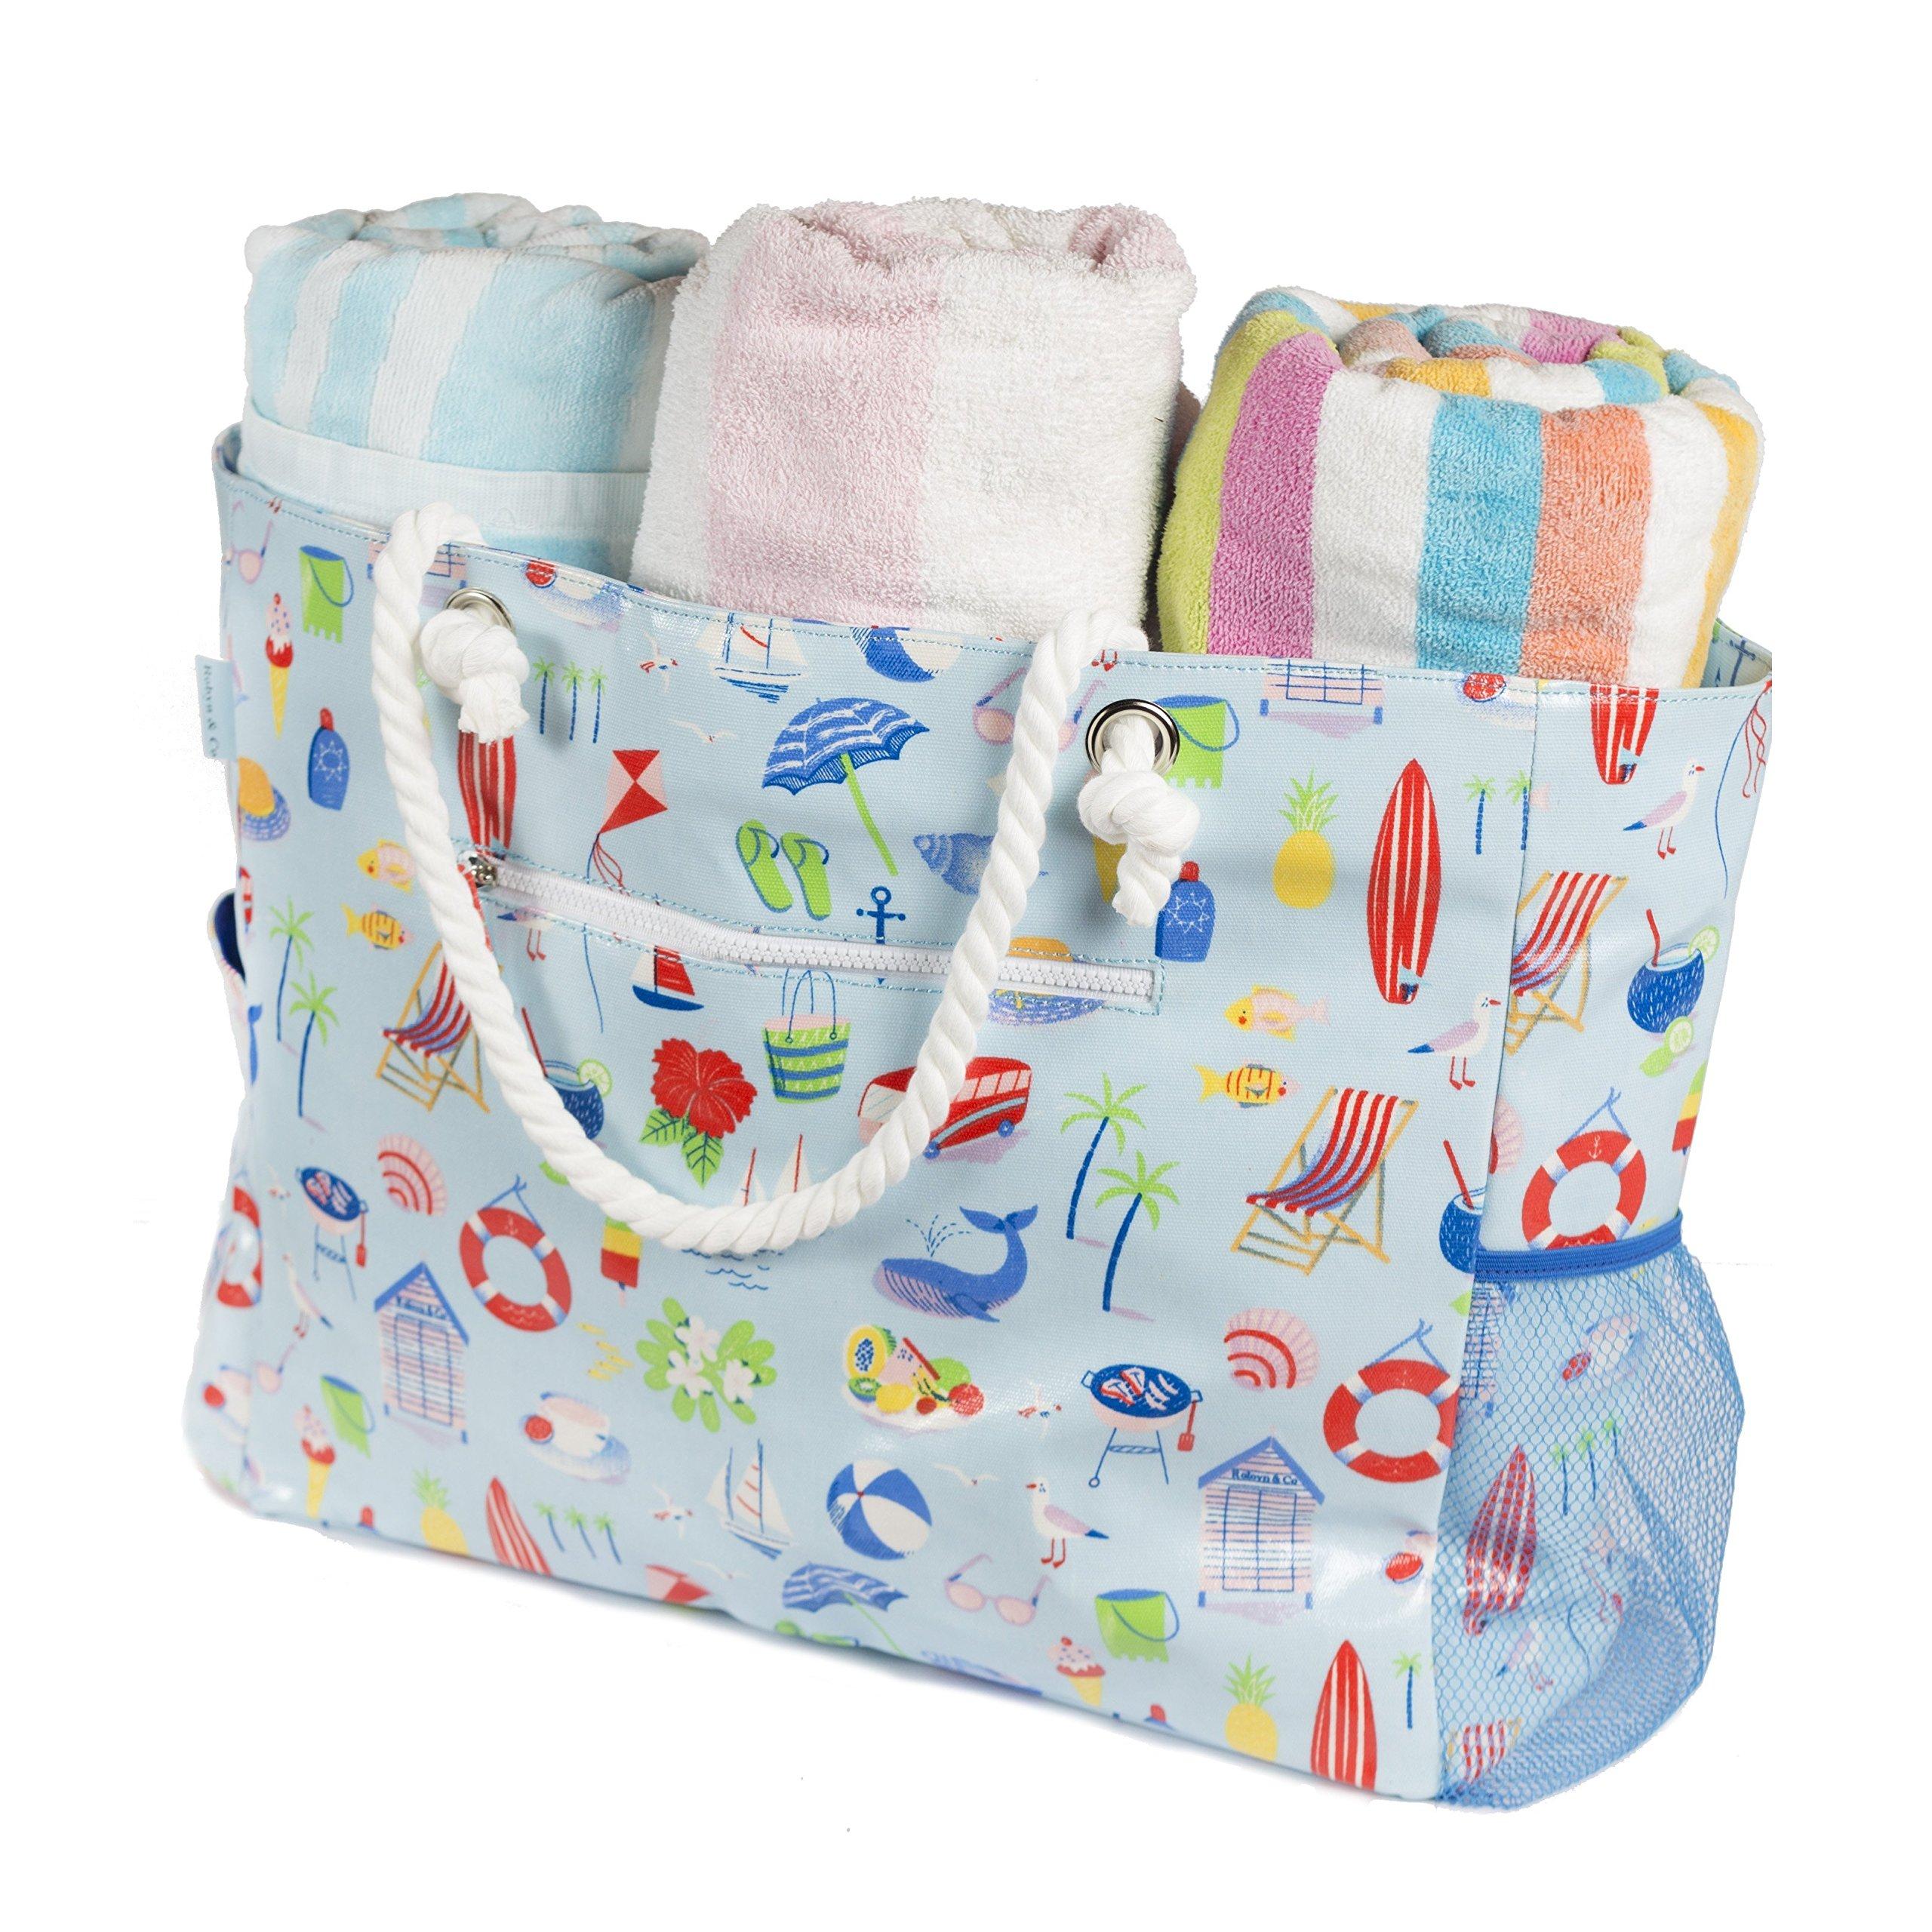 Beach Bag-Waterproof Large Beach Bag-Zippered Canvas Beach Tote-5 pockets-Mesh Pouch